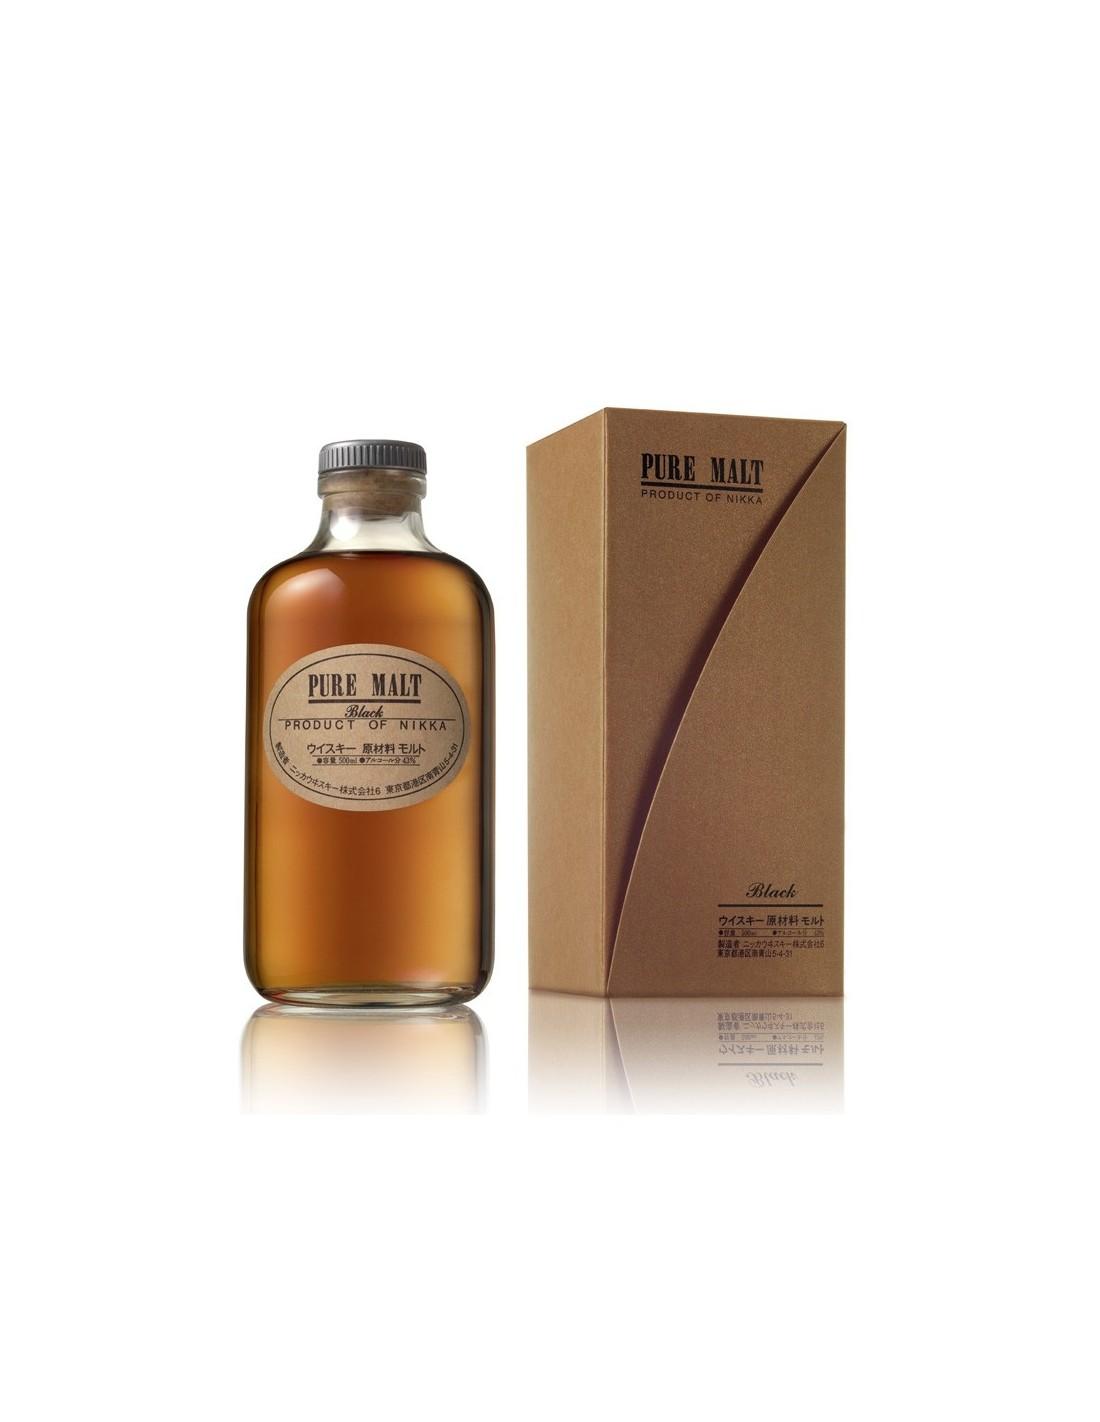 Whisky Nikka Pure Malt Black, 43% alc., 0.5L, Japonia